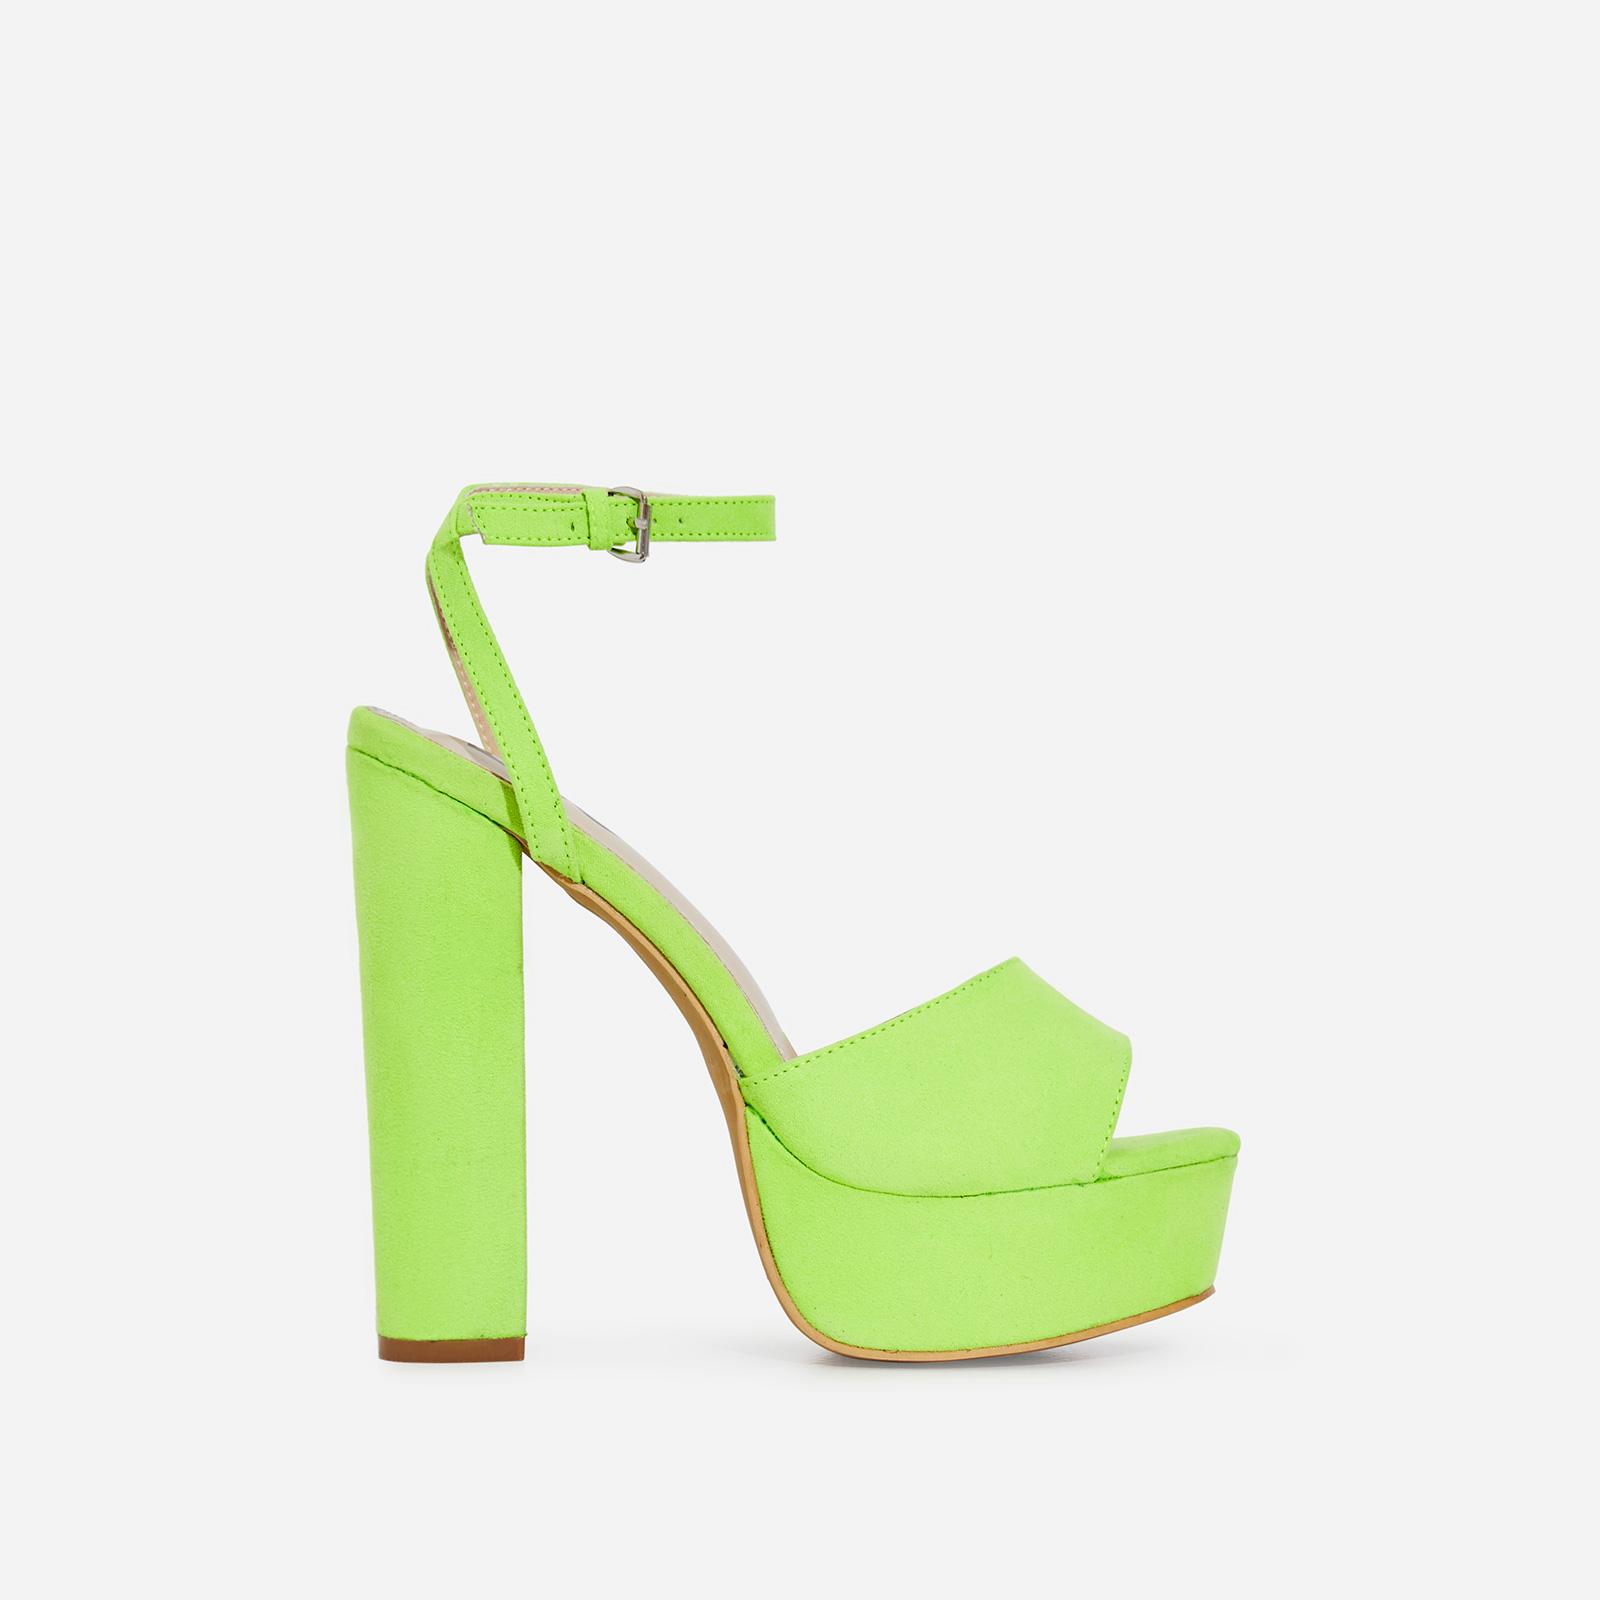 Kaci Platform Block Heel In Lime Green Faux Suede